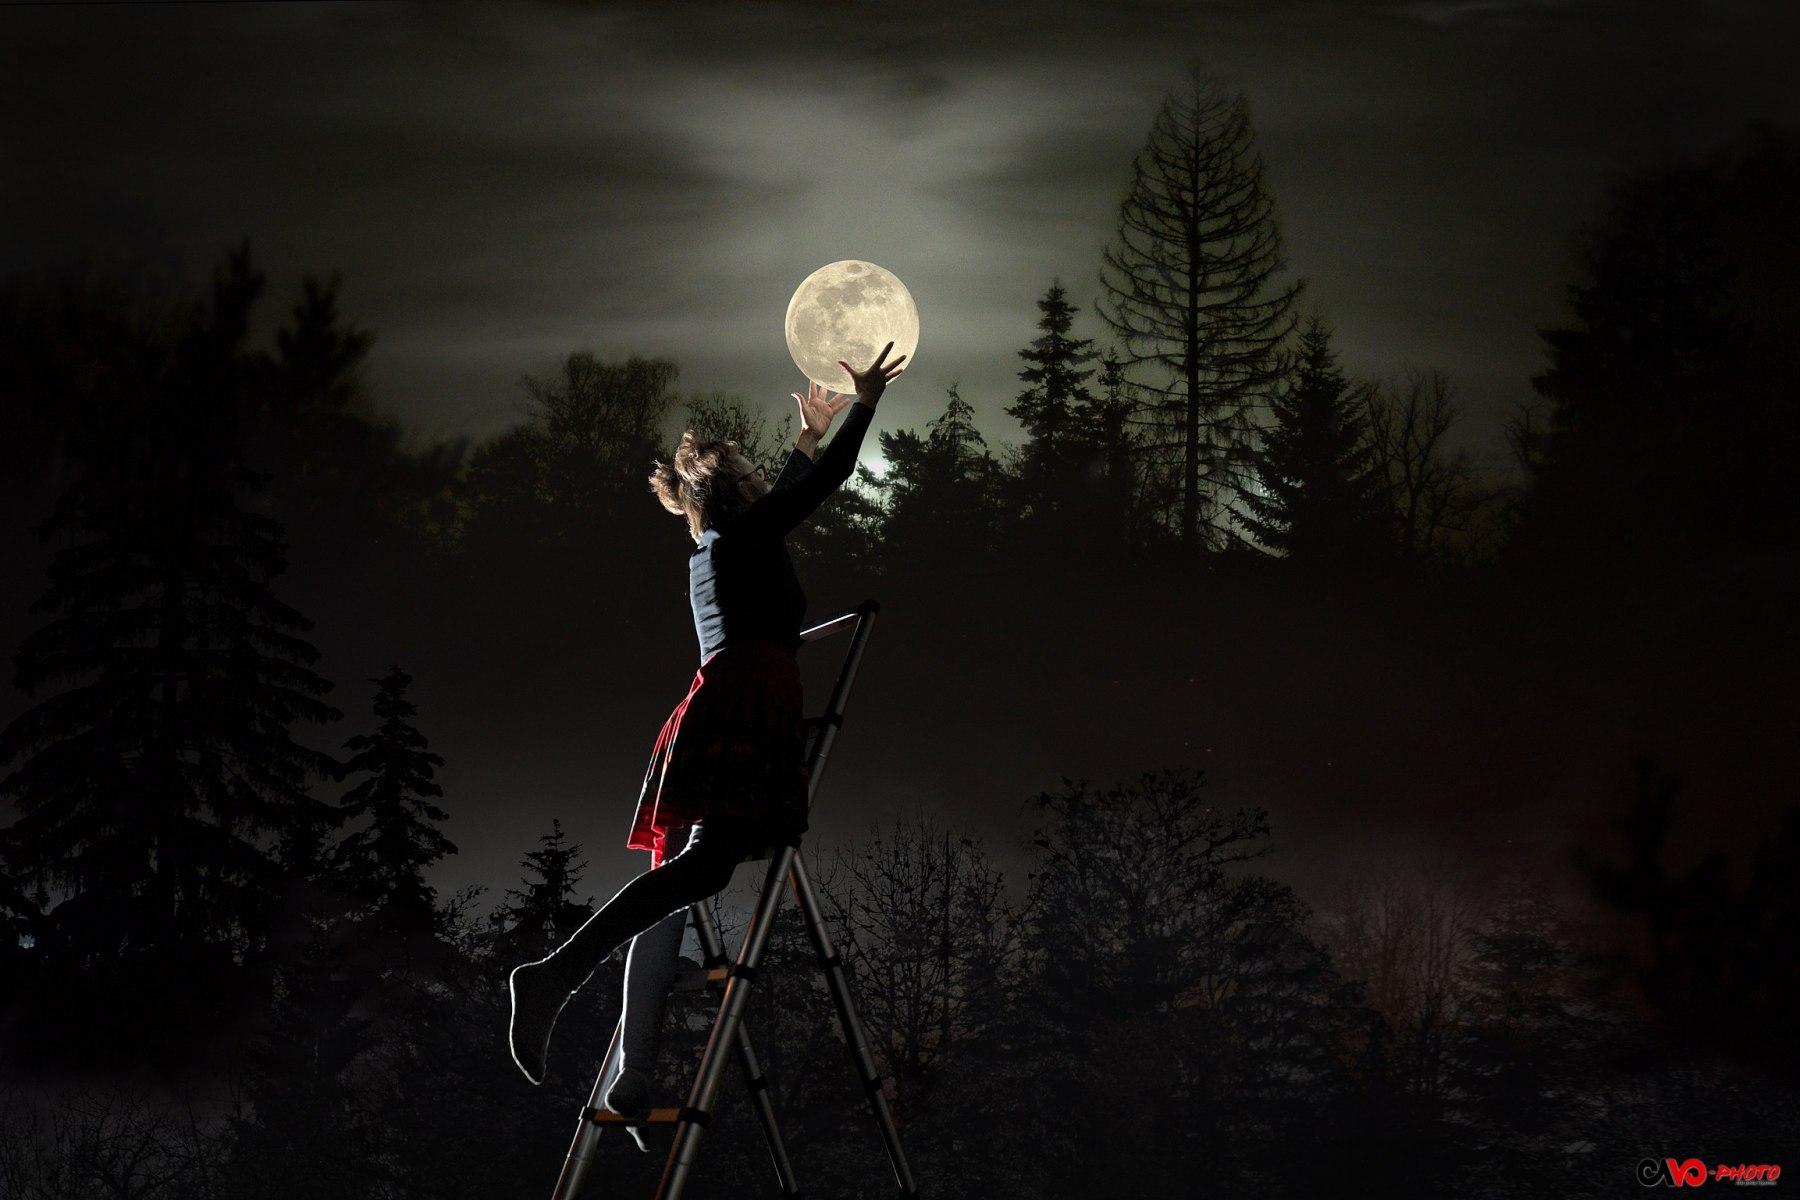 decrocher_la_lune_final_rd